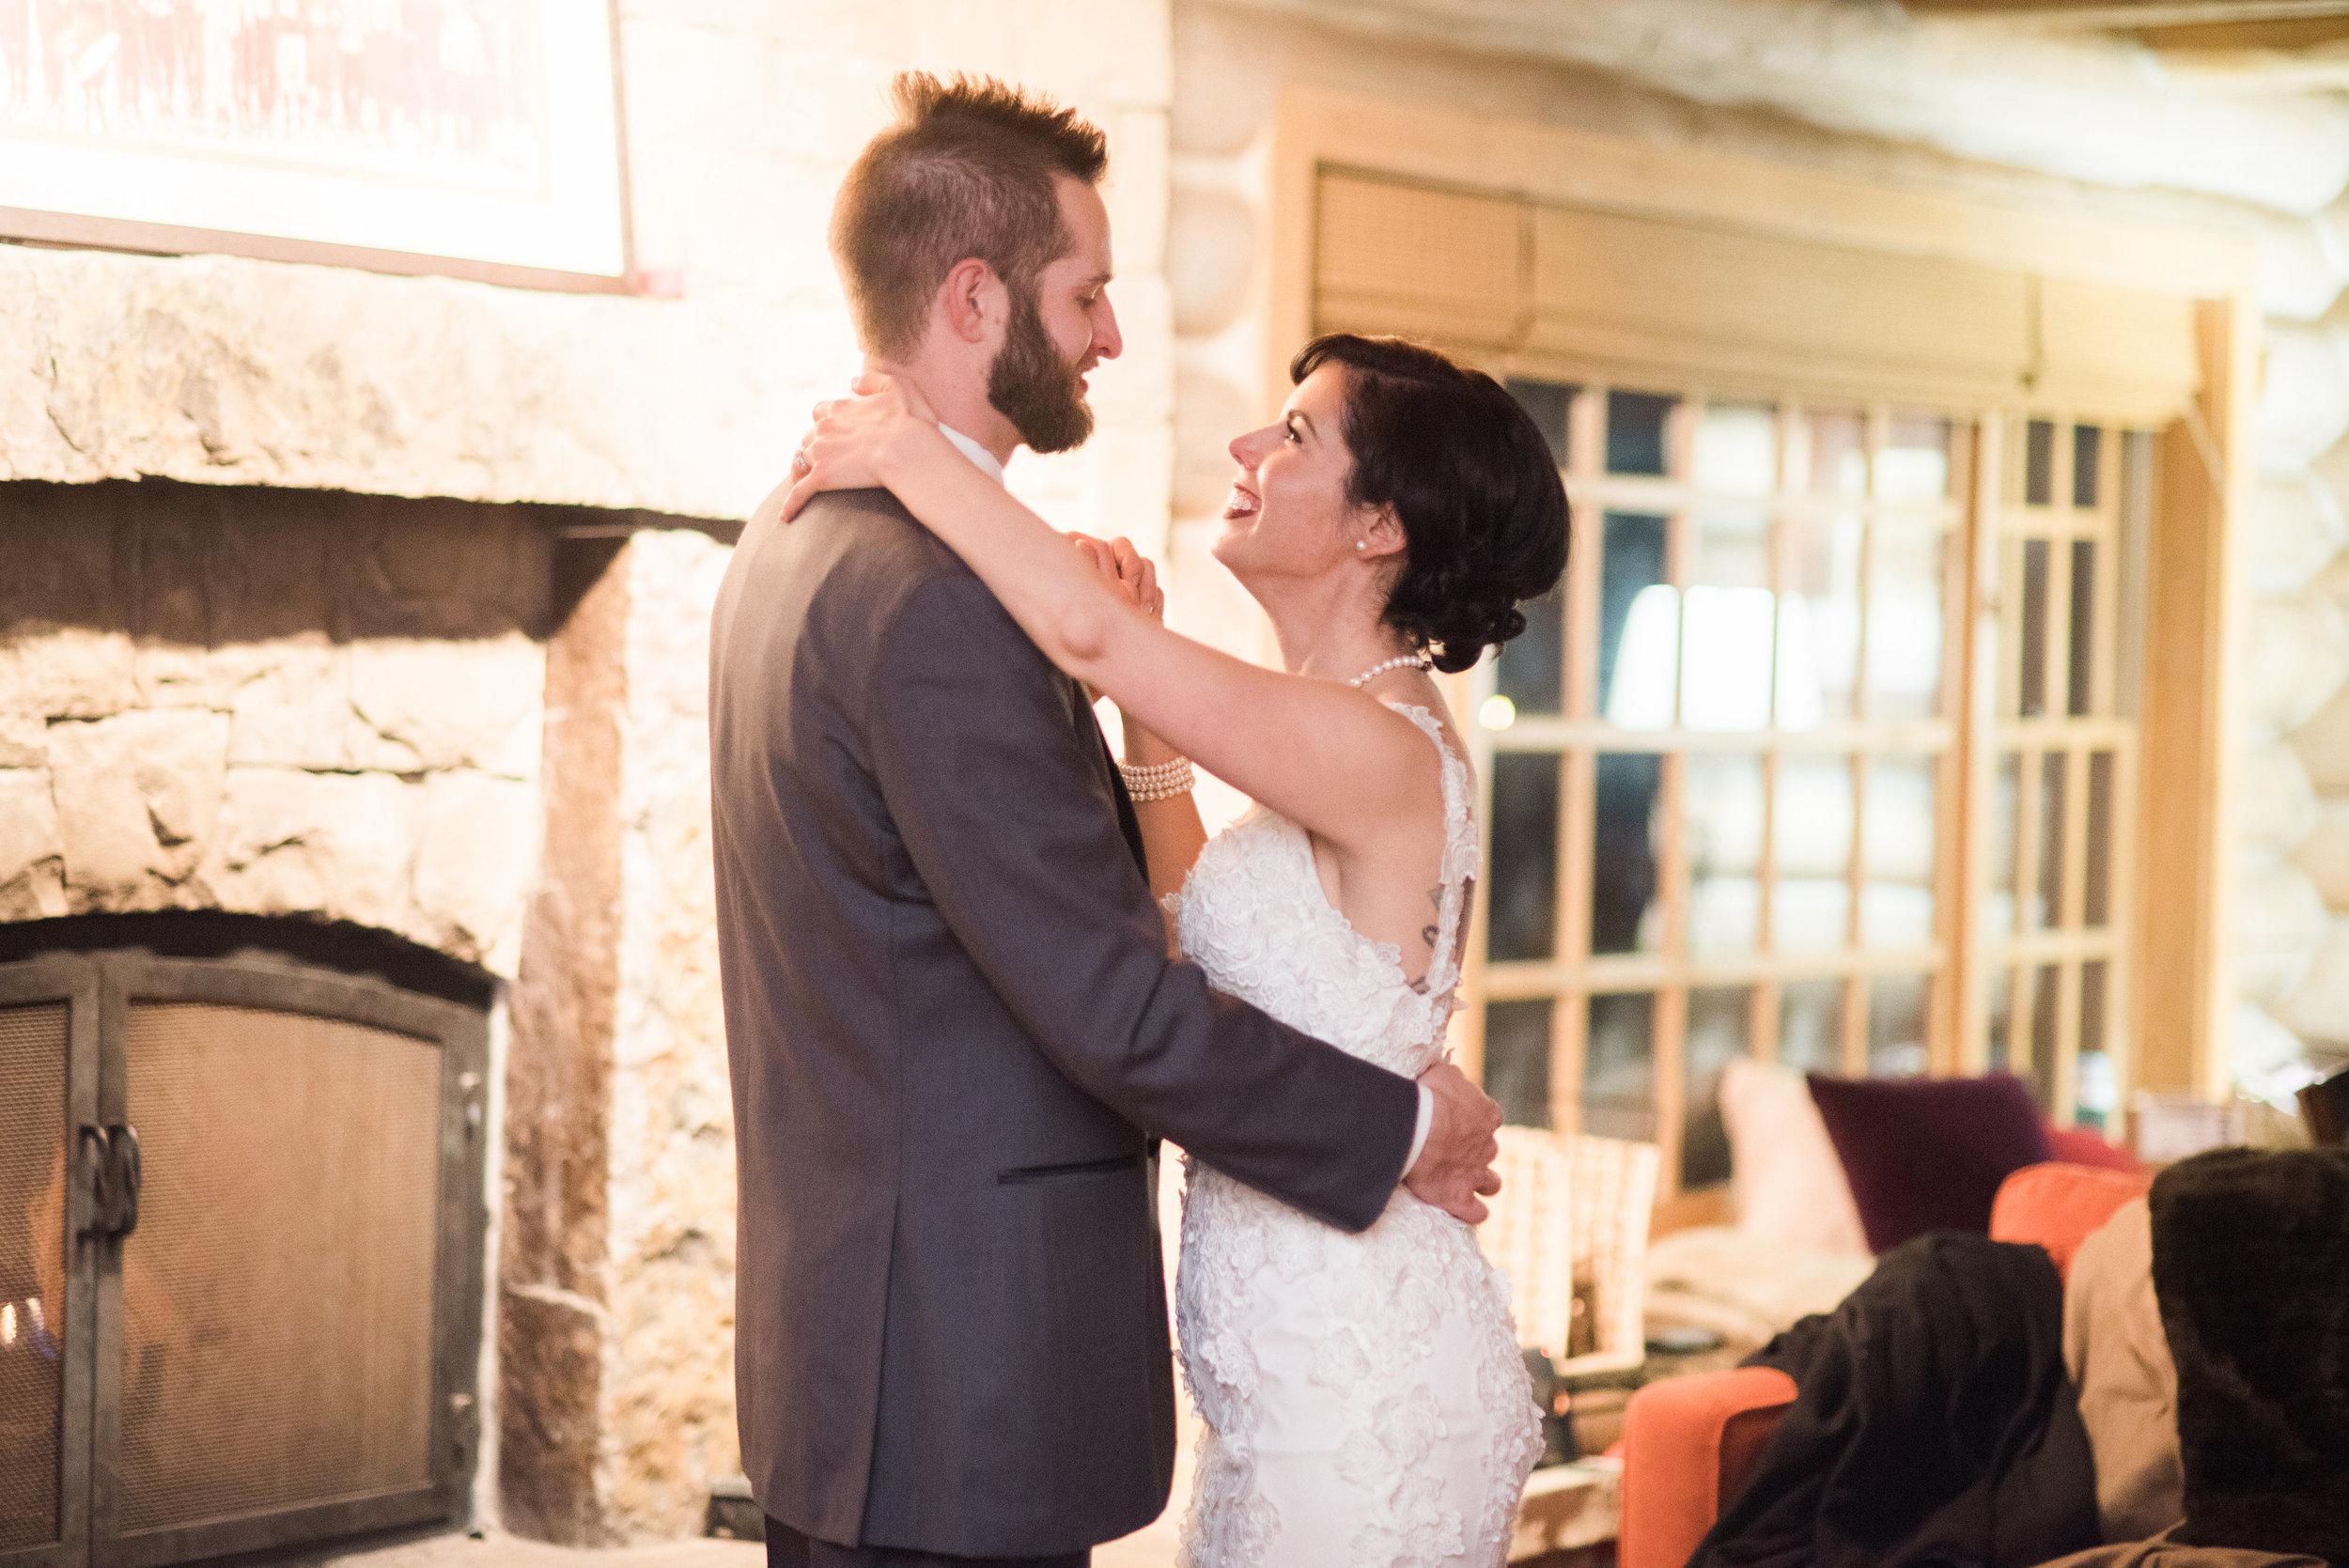 Beaver Creek Mountain wedding | Robert Bullock Bride gown from Little White Dress Bridal Shop in Denver | Ali & Garrett Wedding Photographers